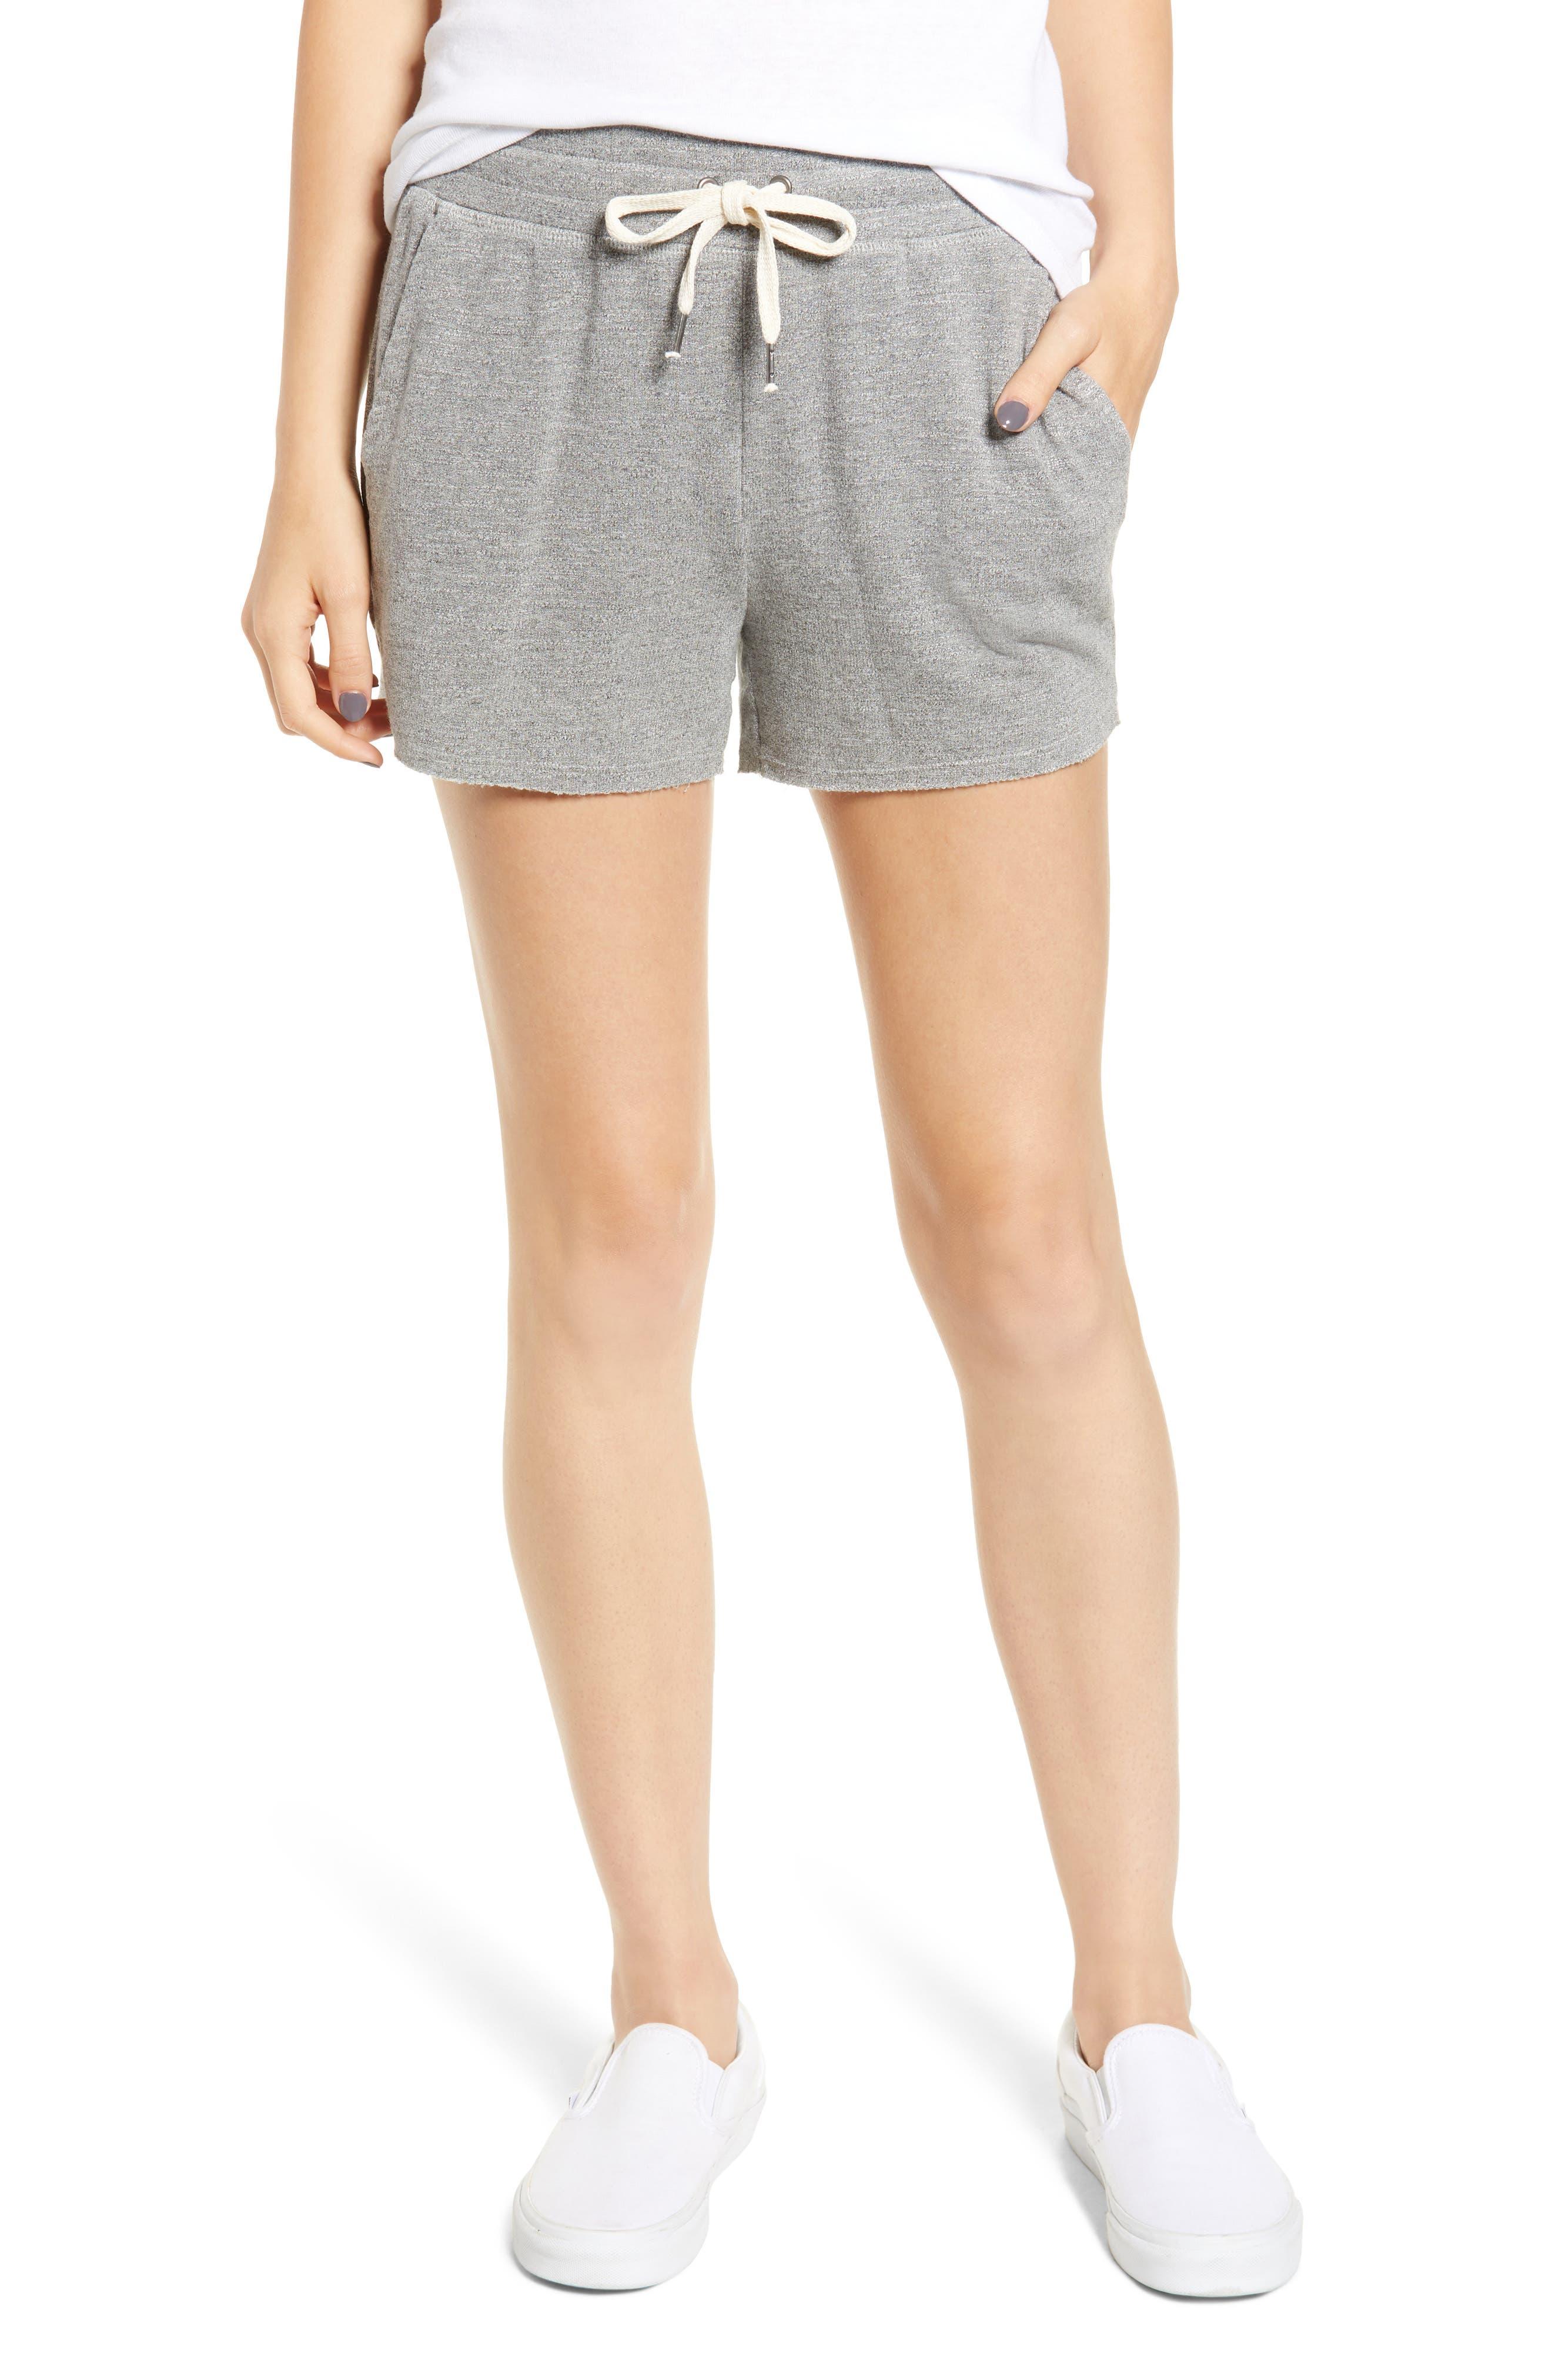 Active Shorts,                         Main,                         color, HEATHER GREY